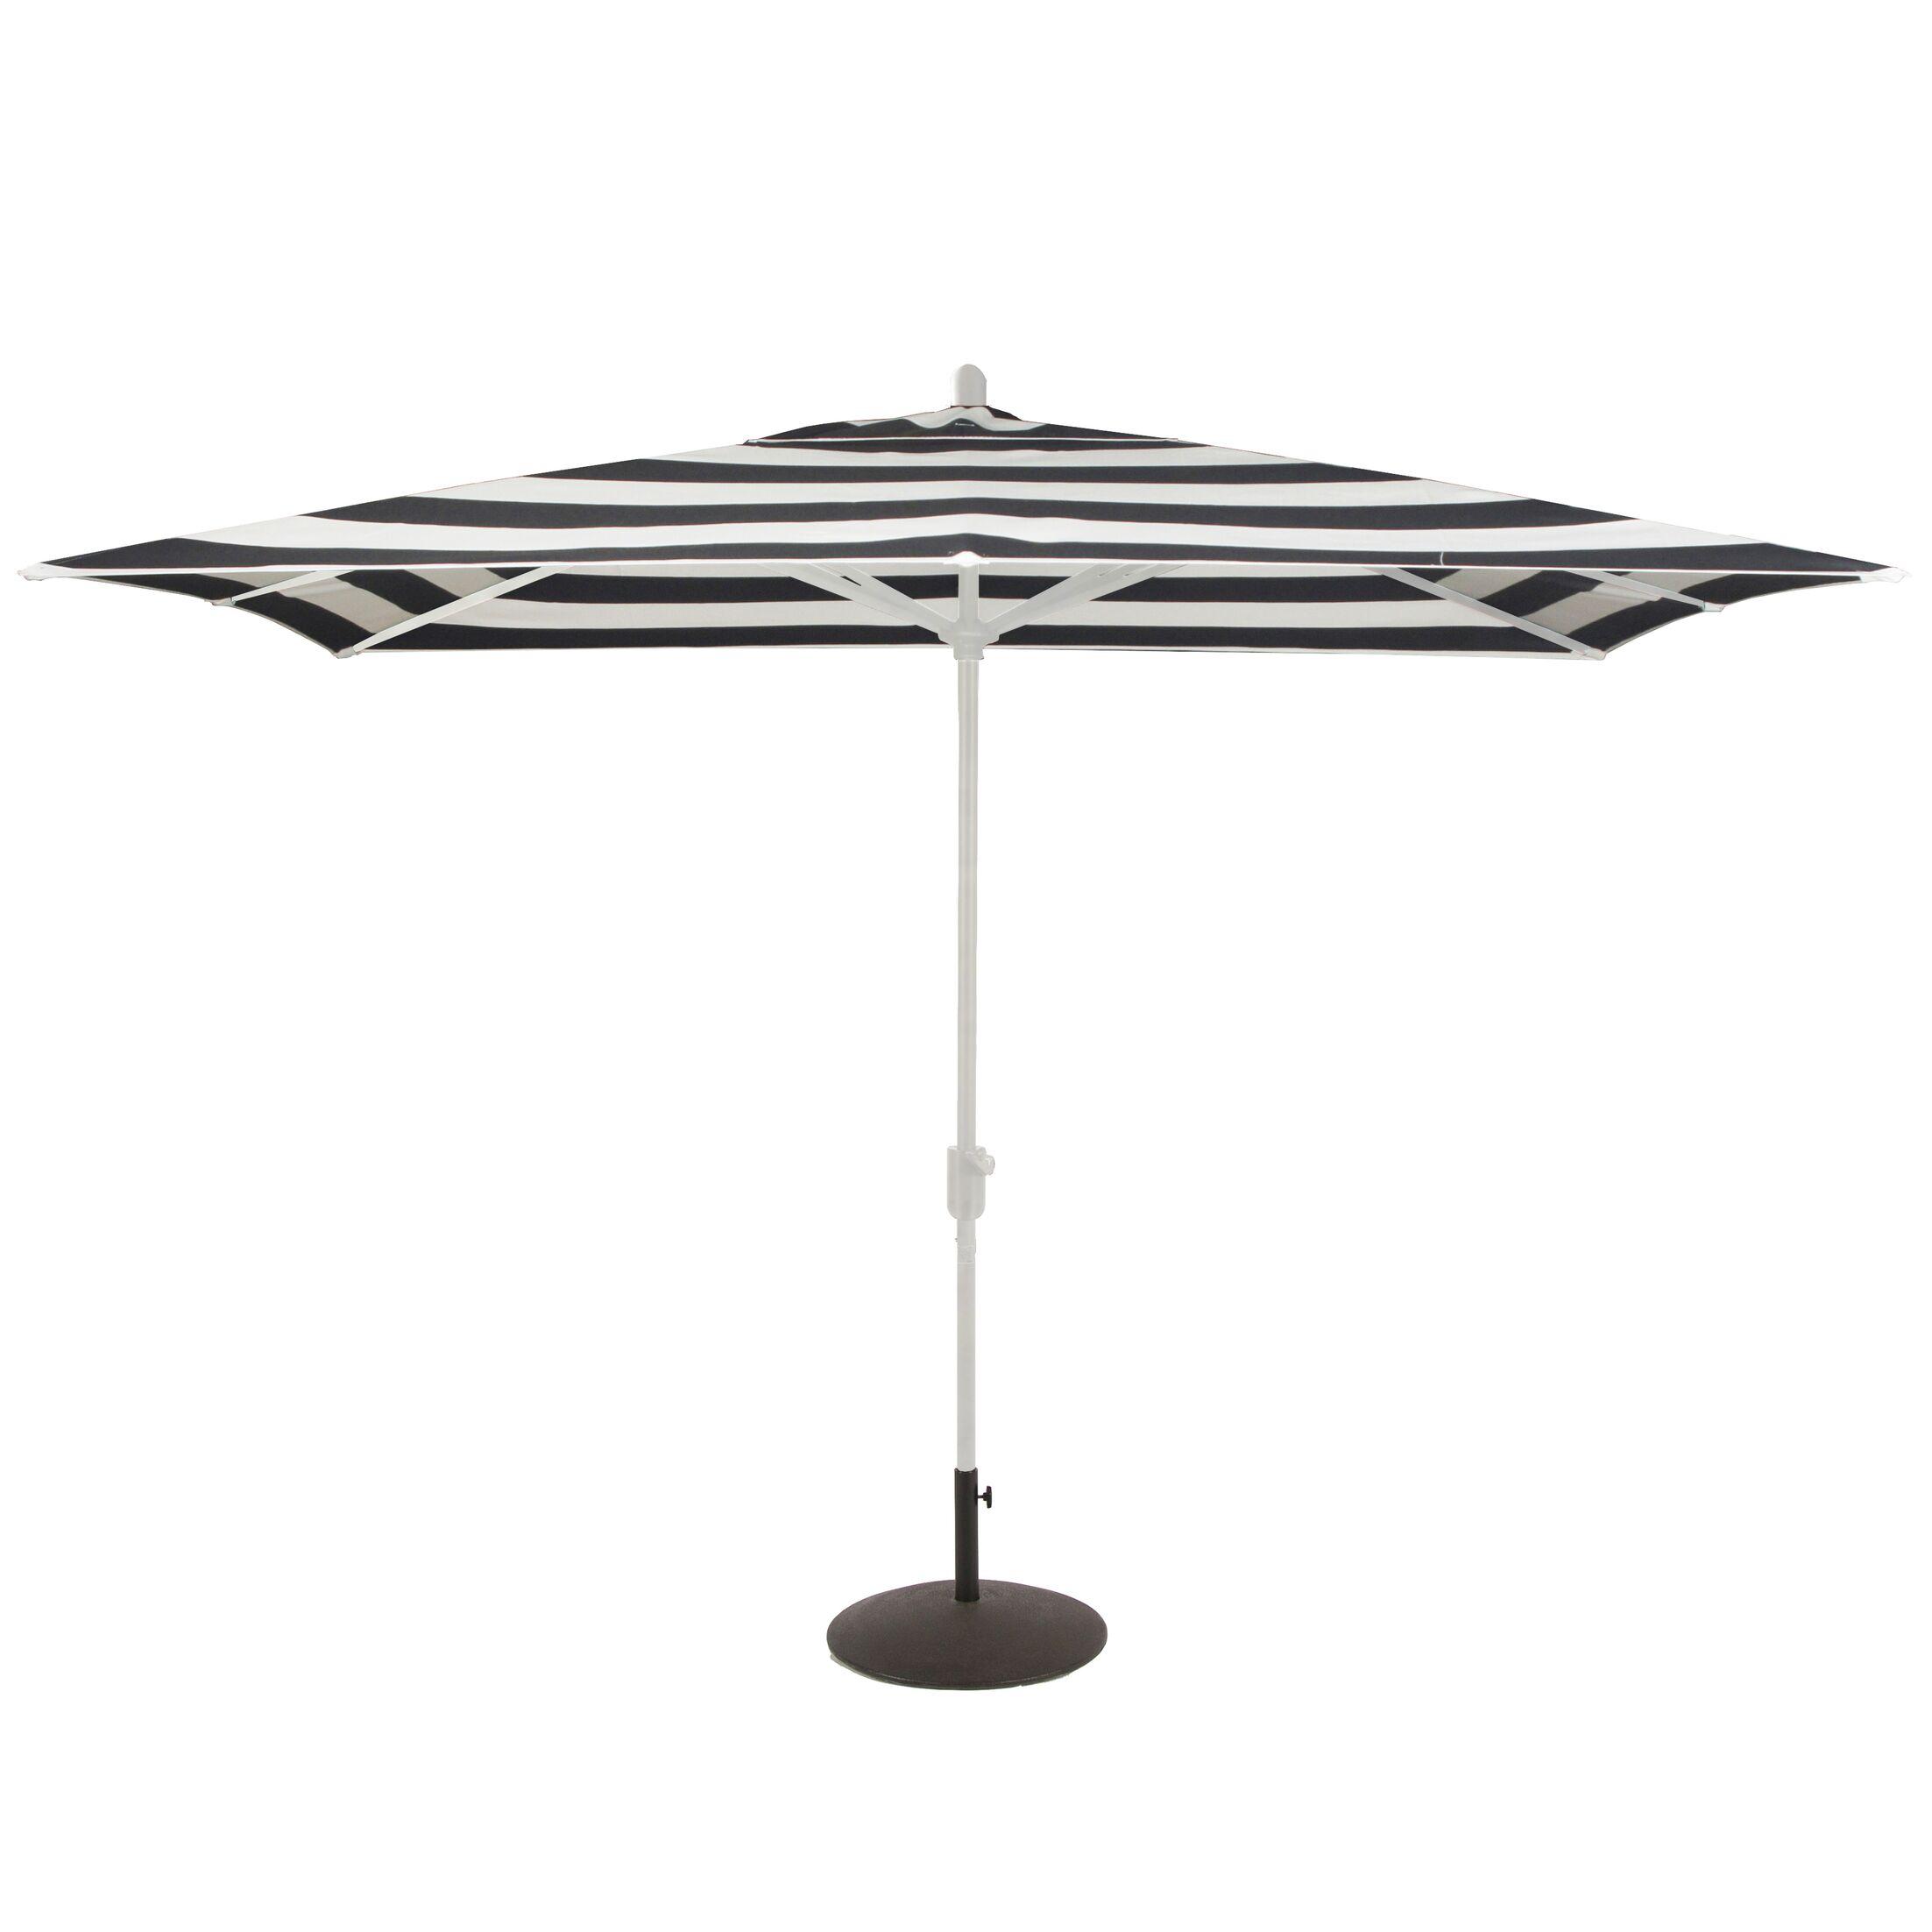 Centers 10' x 6.5' Rectangular Market Sunbrella Umbrella Fabric Color: Black Stripe, Frame Color: White Sand